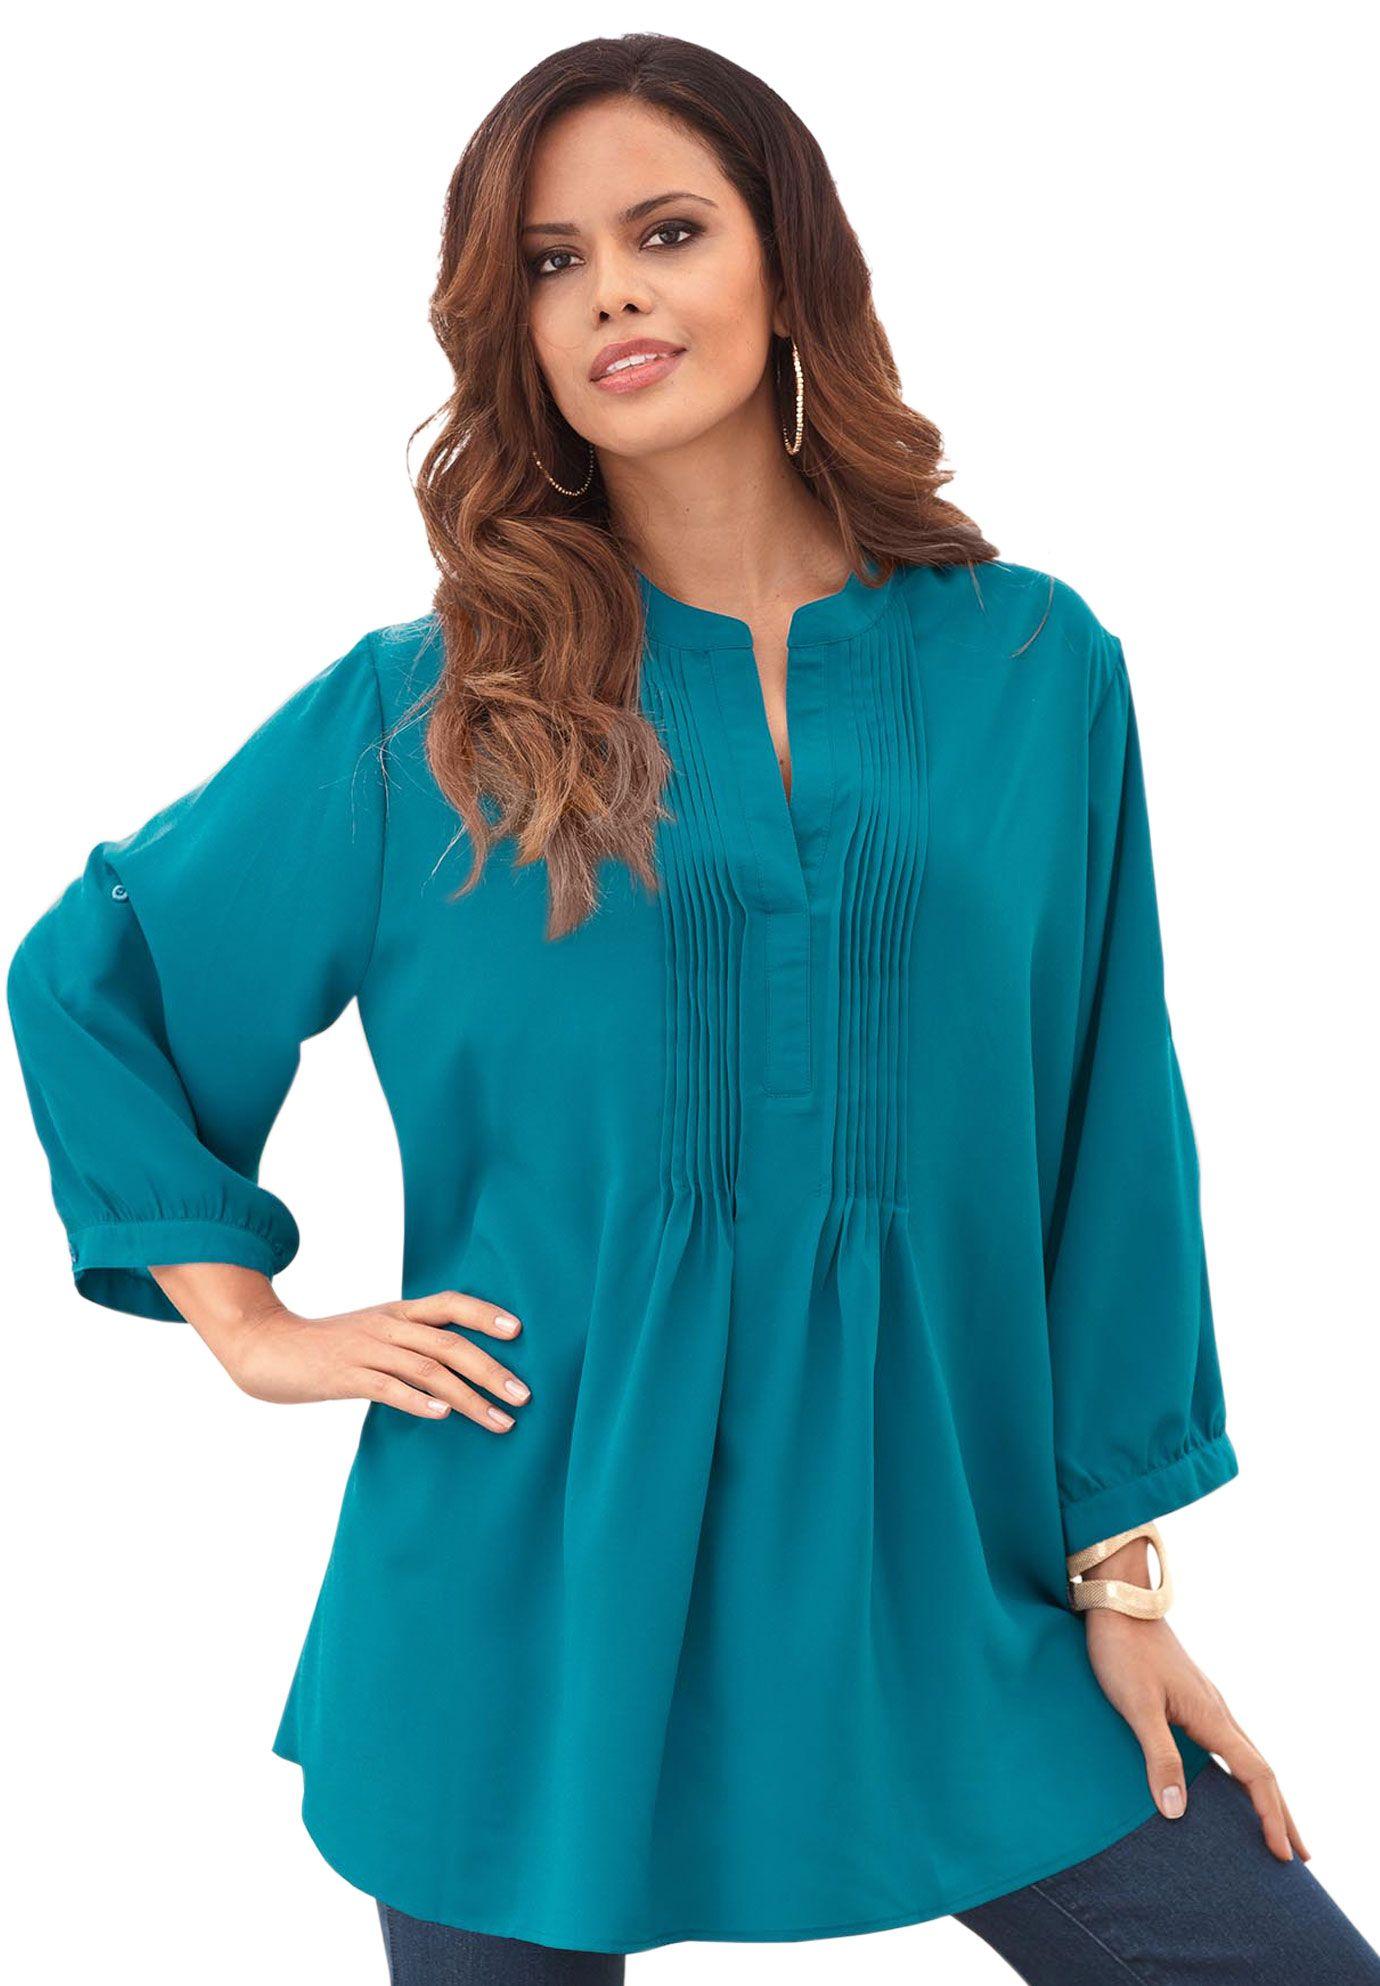 58d7689cd8 Plus Size Clothing - Fashion for Plus Size women at Roaman s ...